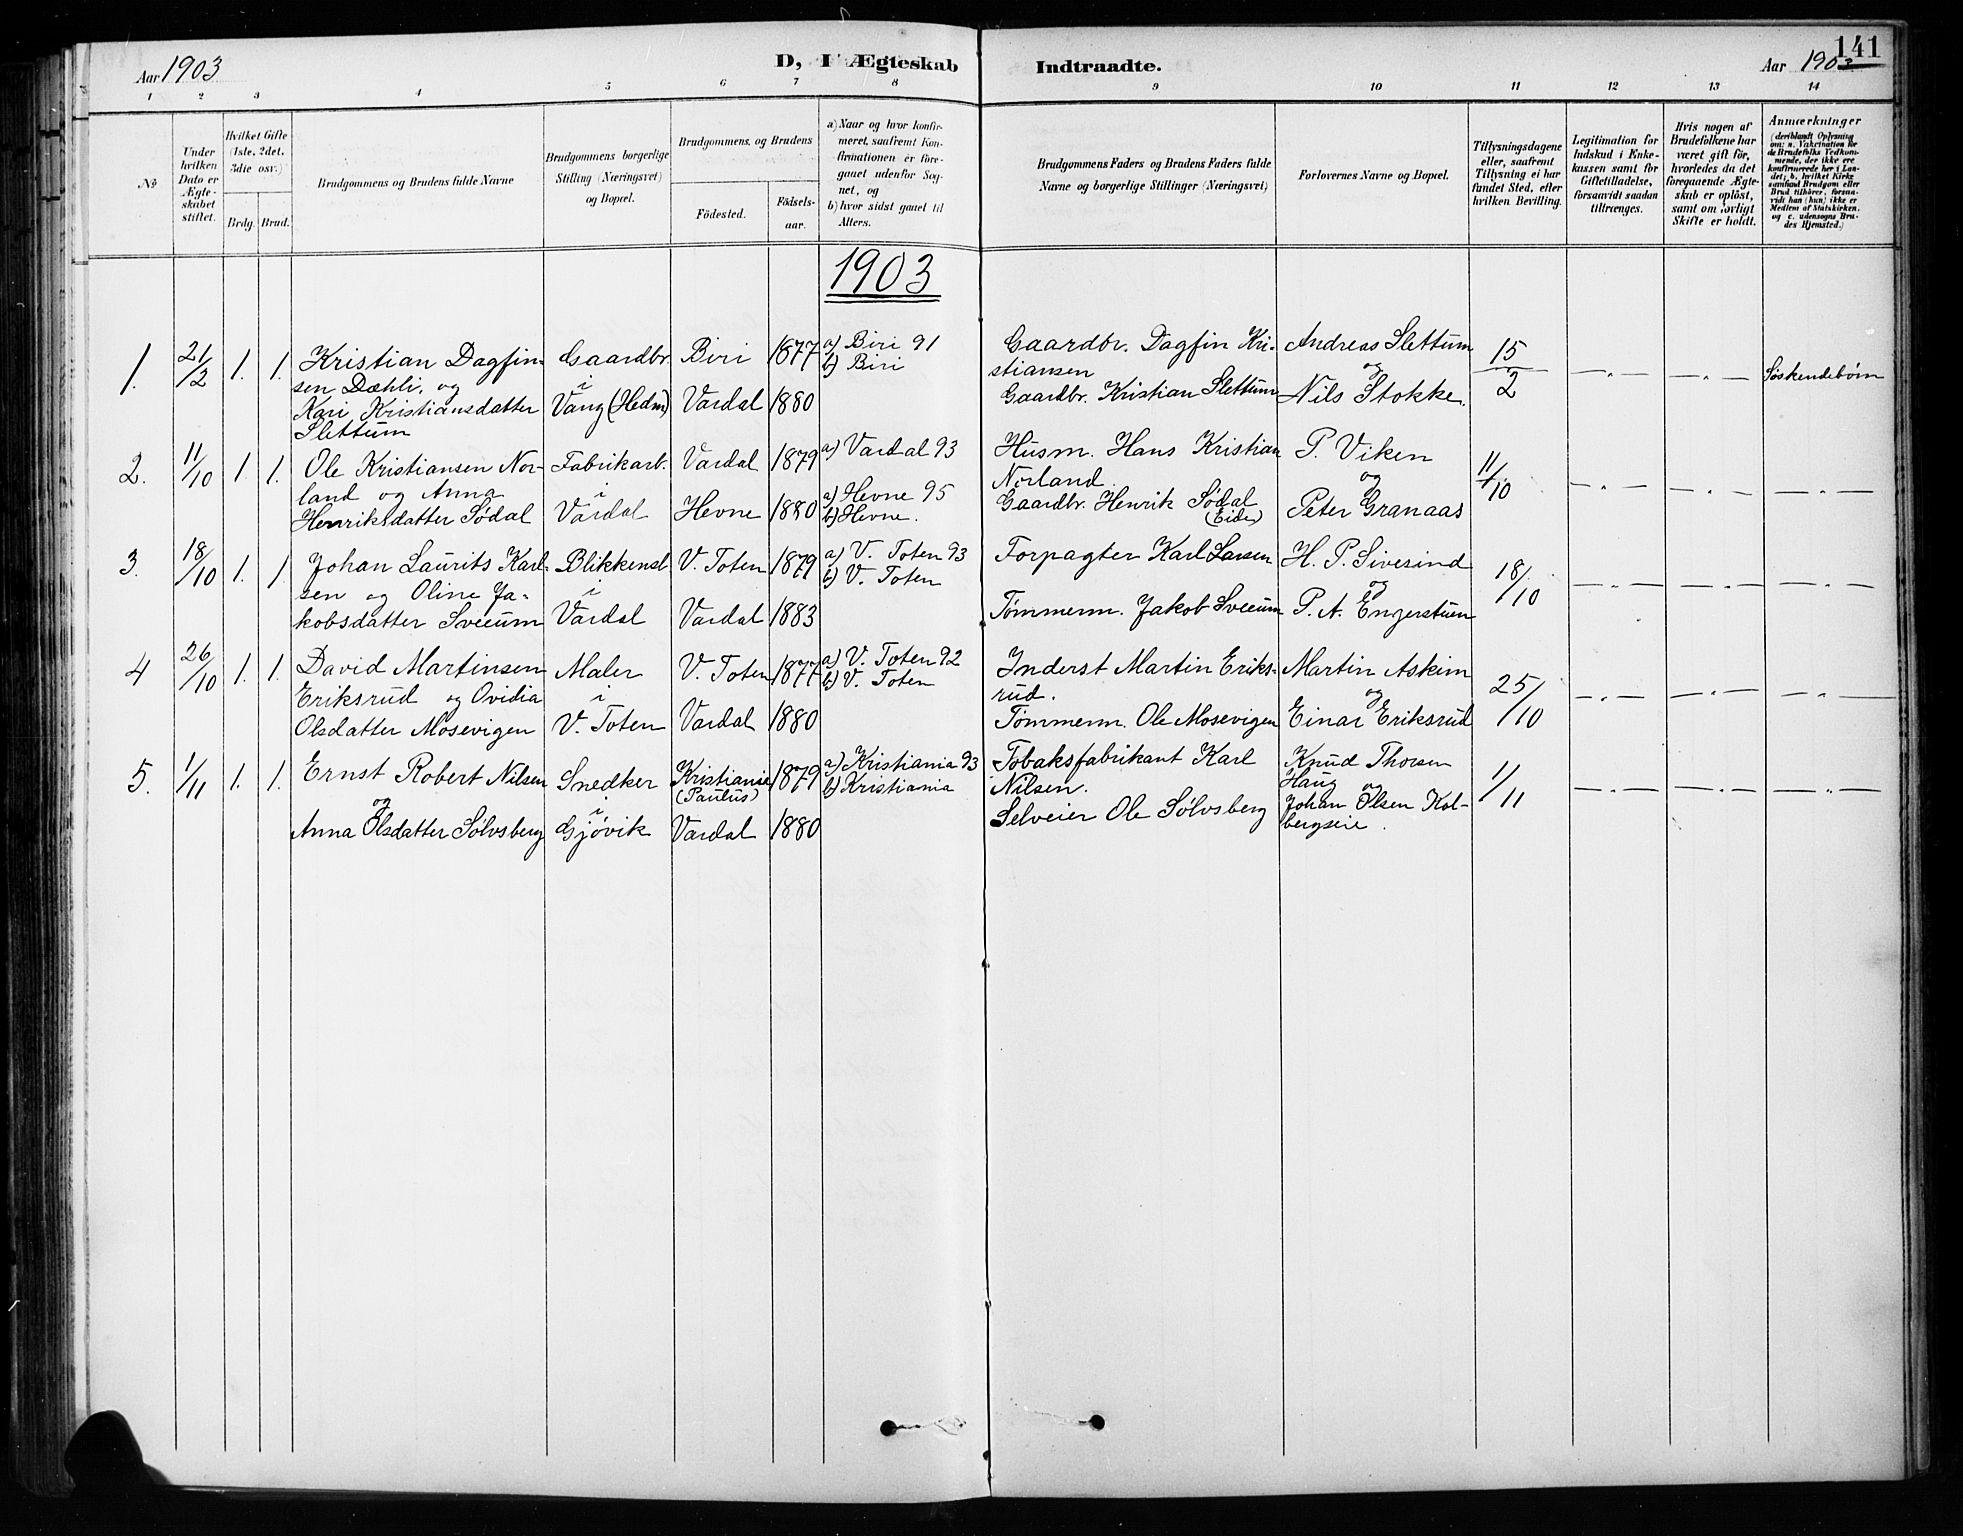 SAH, Vardal prestekontor, H/Ha/Hab/L0010: Klokkerbok nr. 10, 1895-1903, s. 141